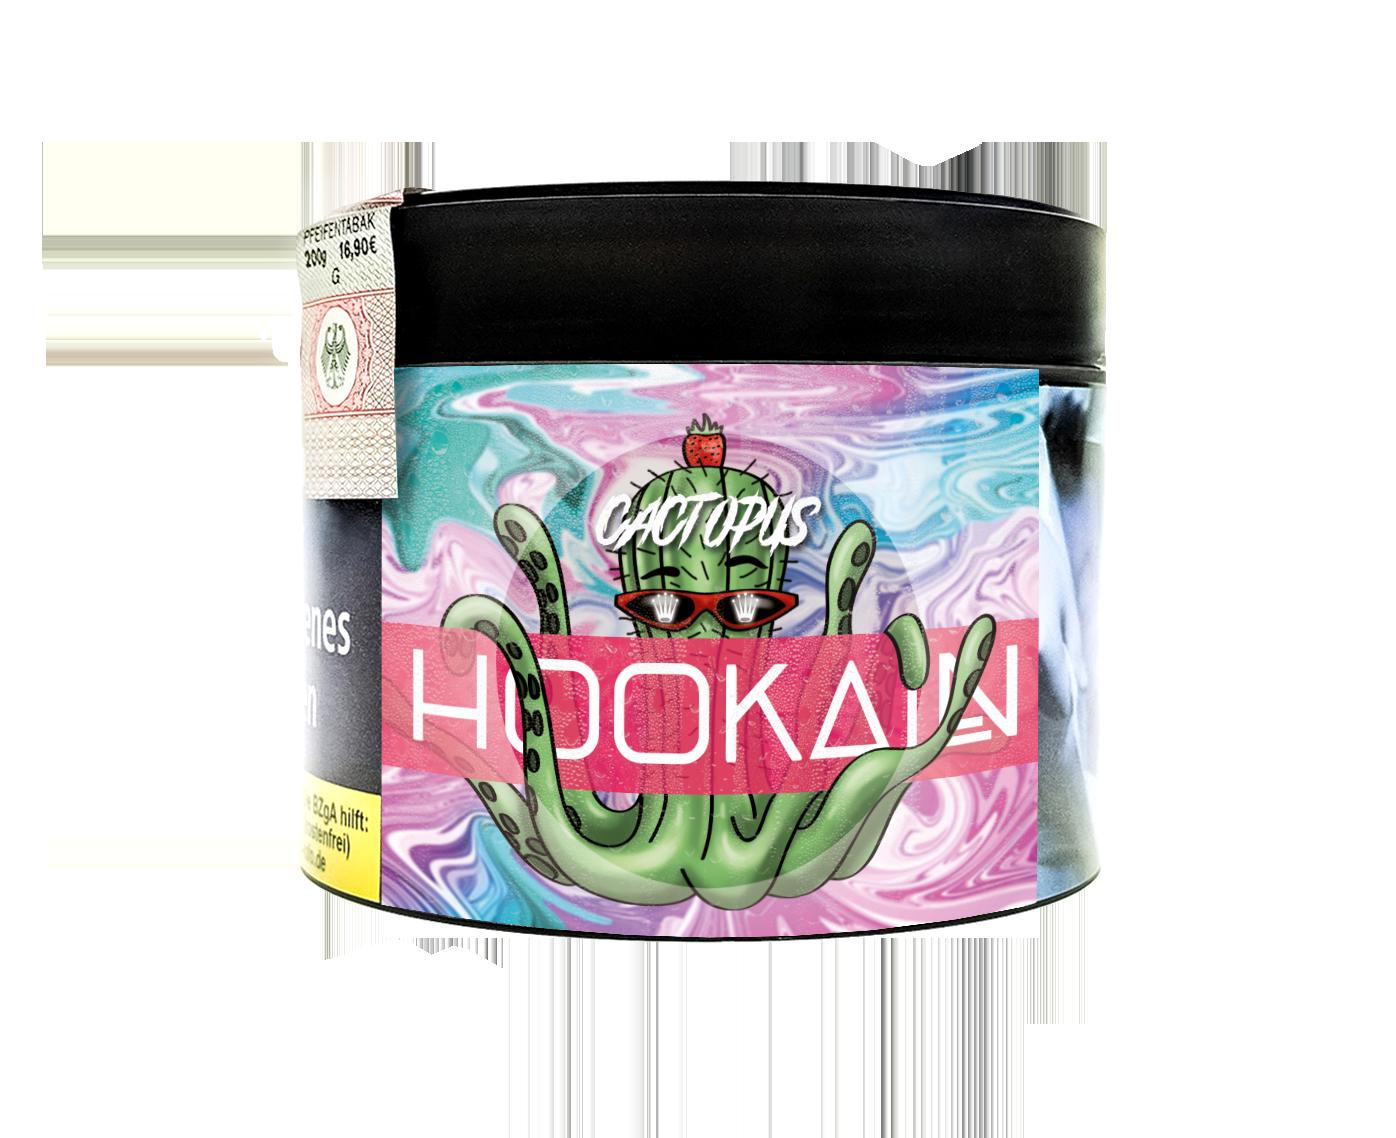 Hookain Tobacco - Cactopus 200g